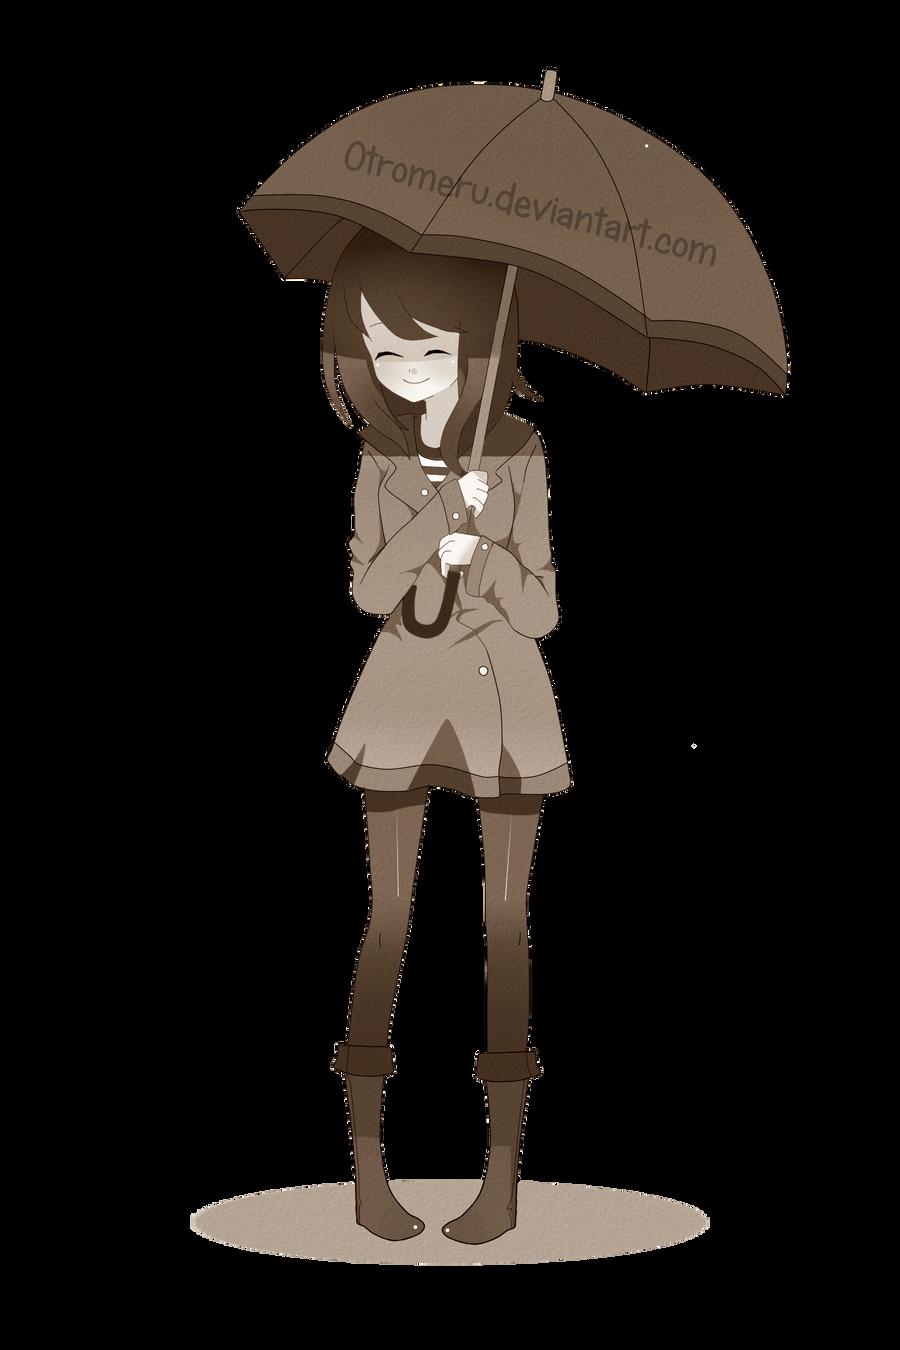 Under my umbrella by Otromeru